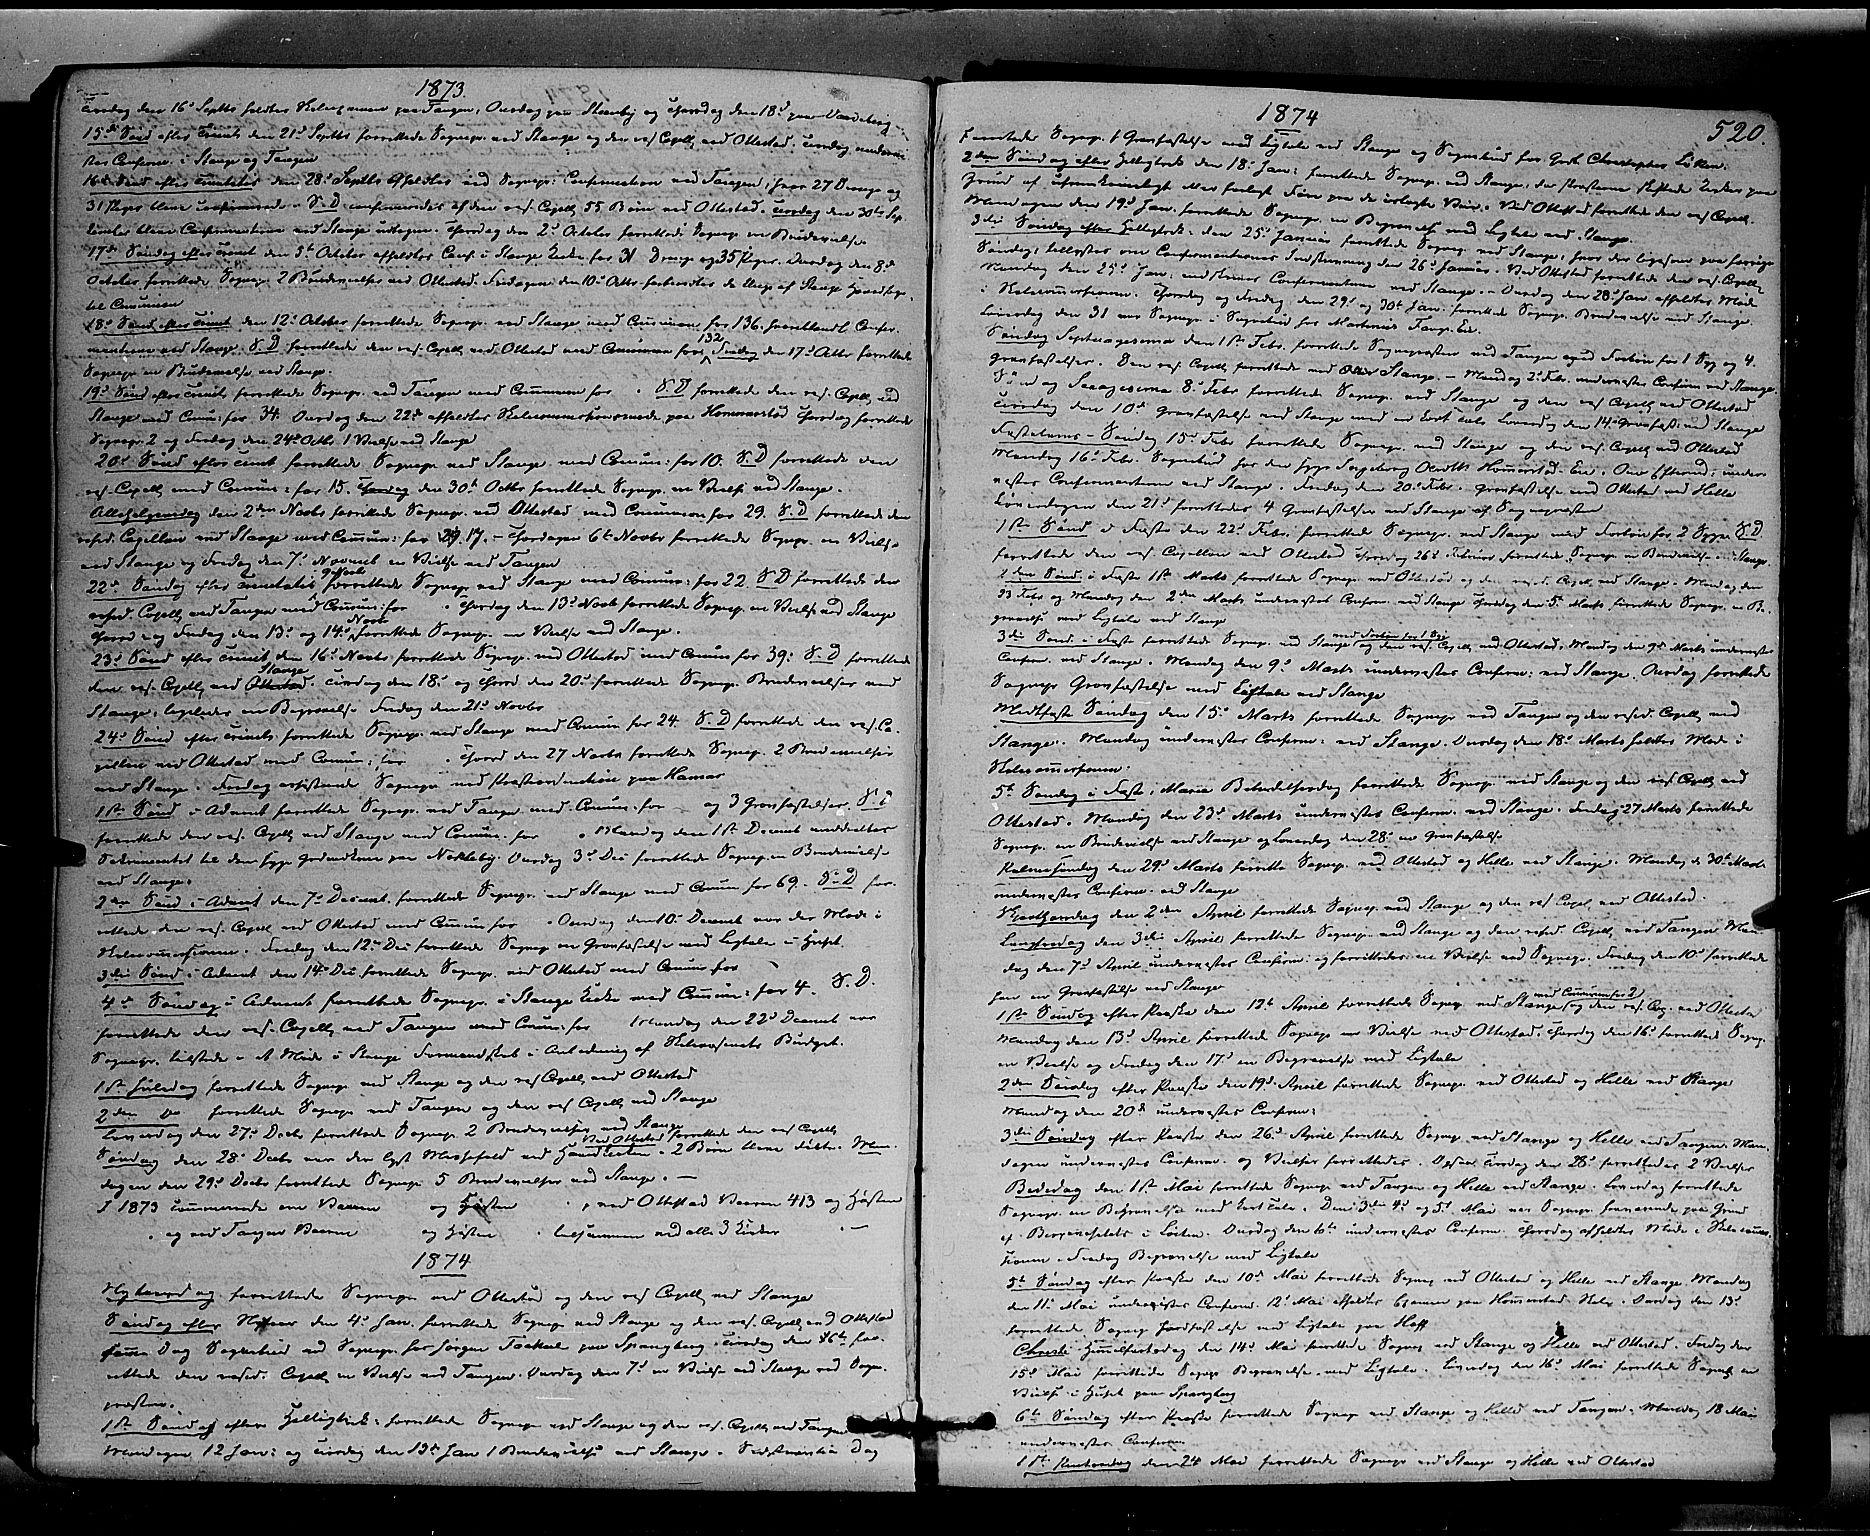 SAH, Stange prestekontor, K/L0013: Ministerialbok nr. 13, 1862-1879, s. 520